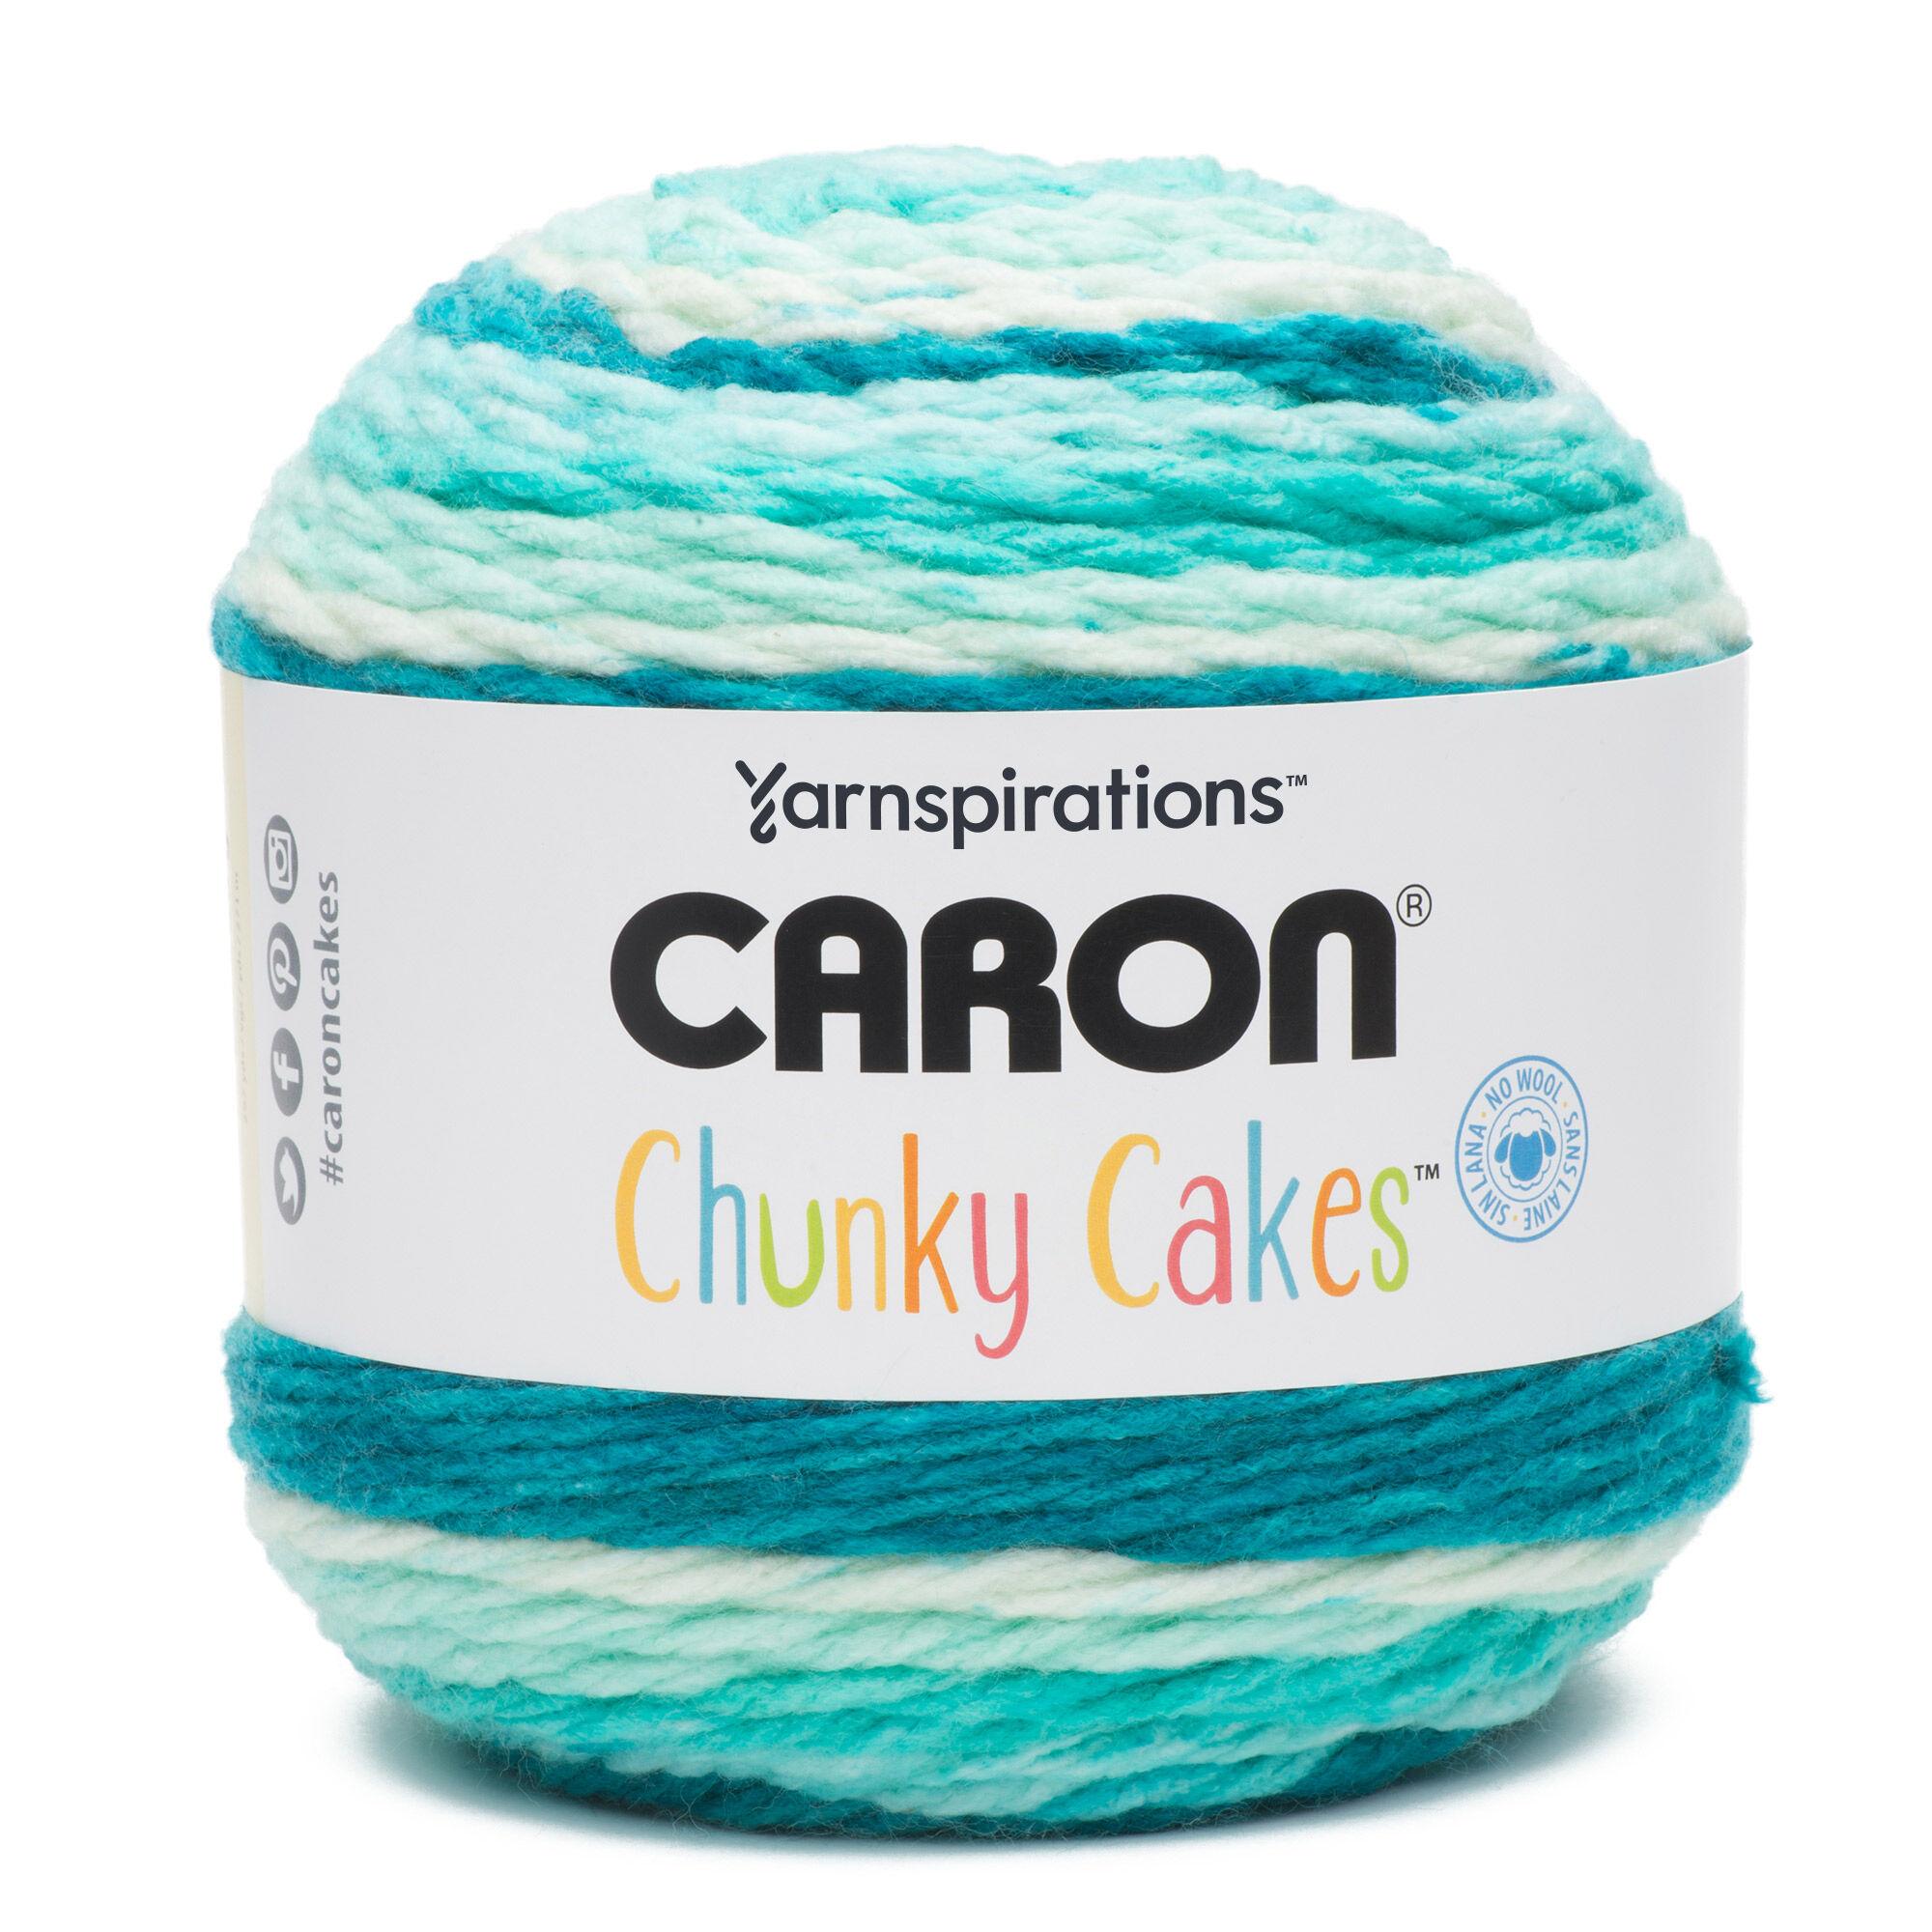 Caron Chunky Cakes Yarn, Blue Moon | Yarnspirations